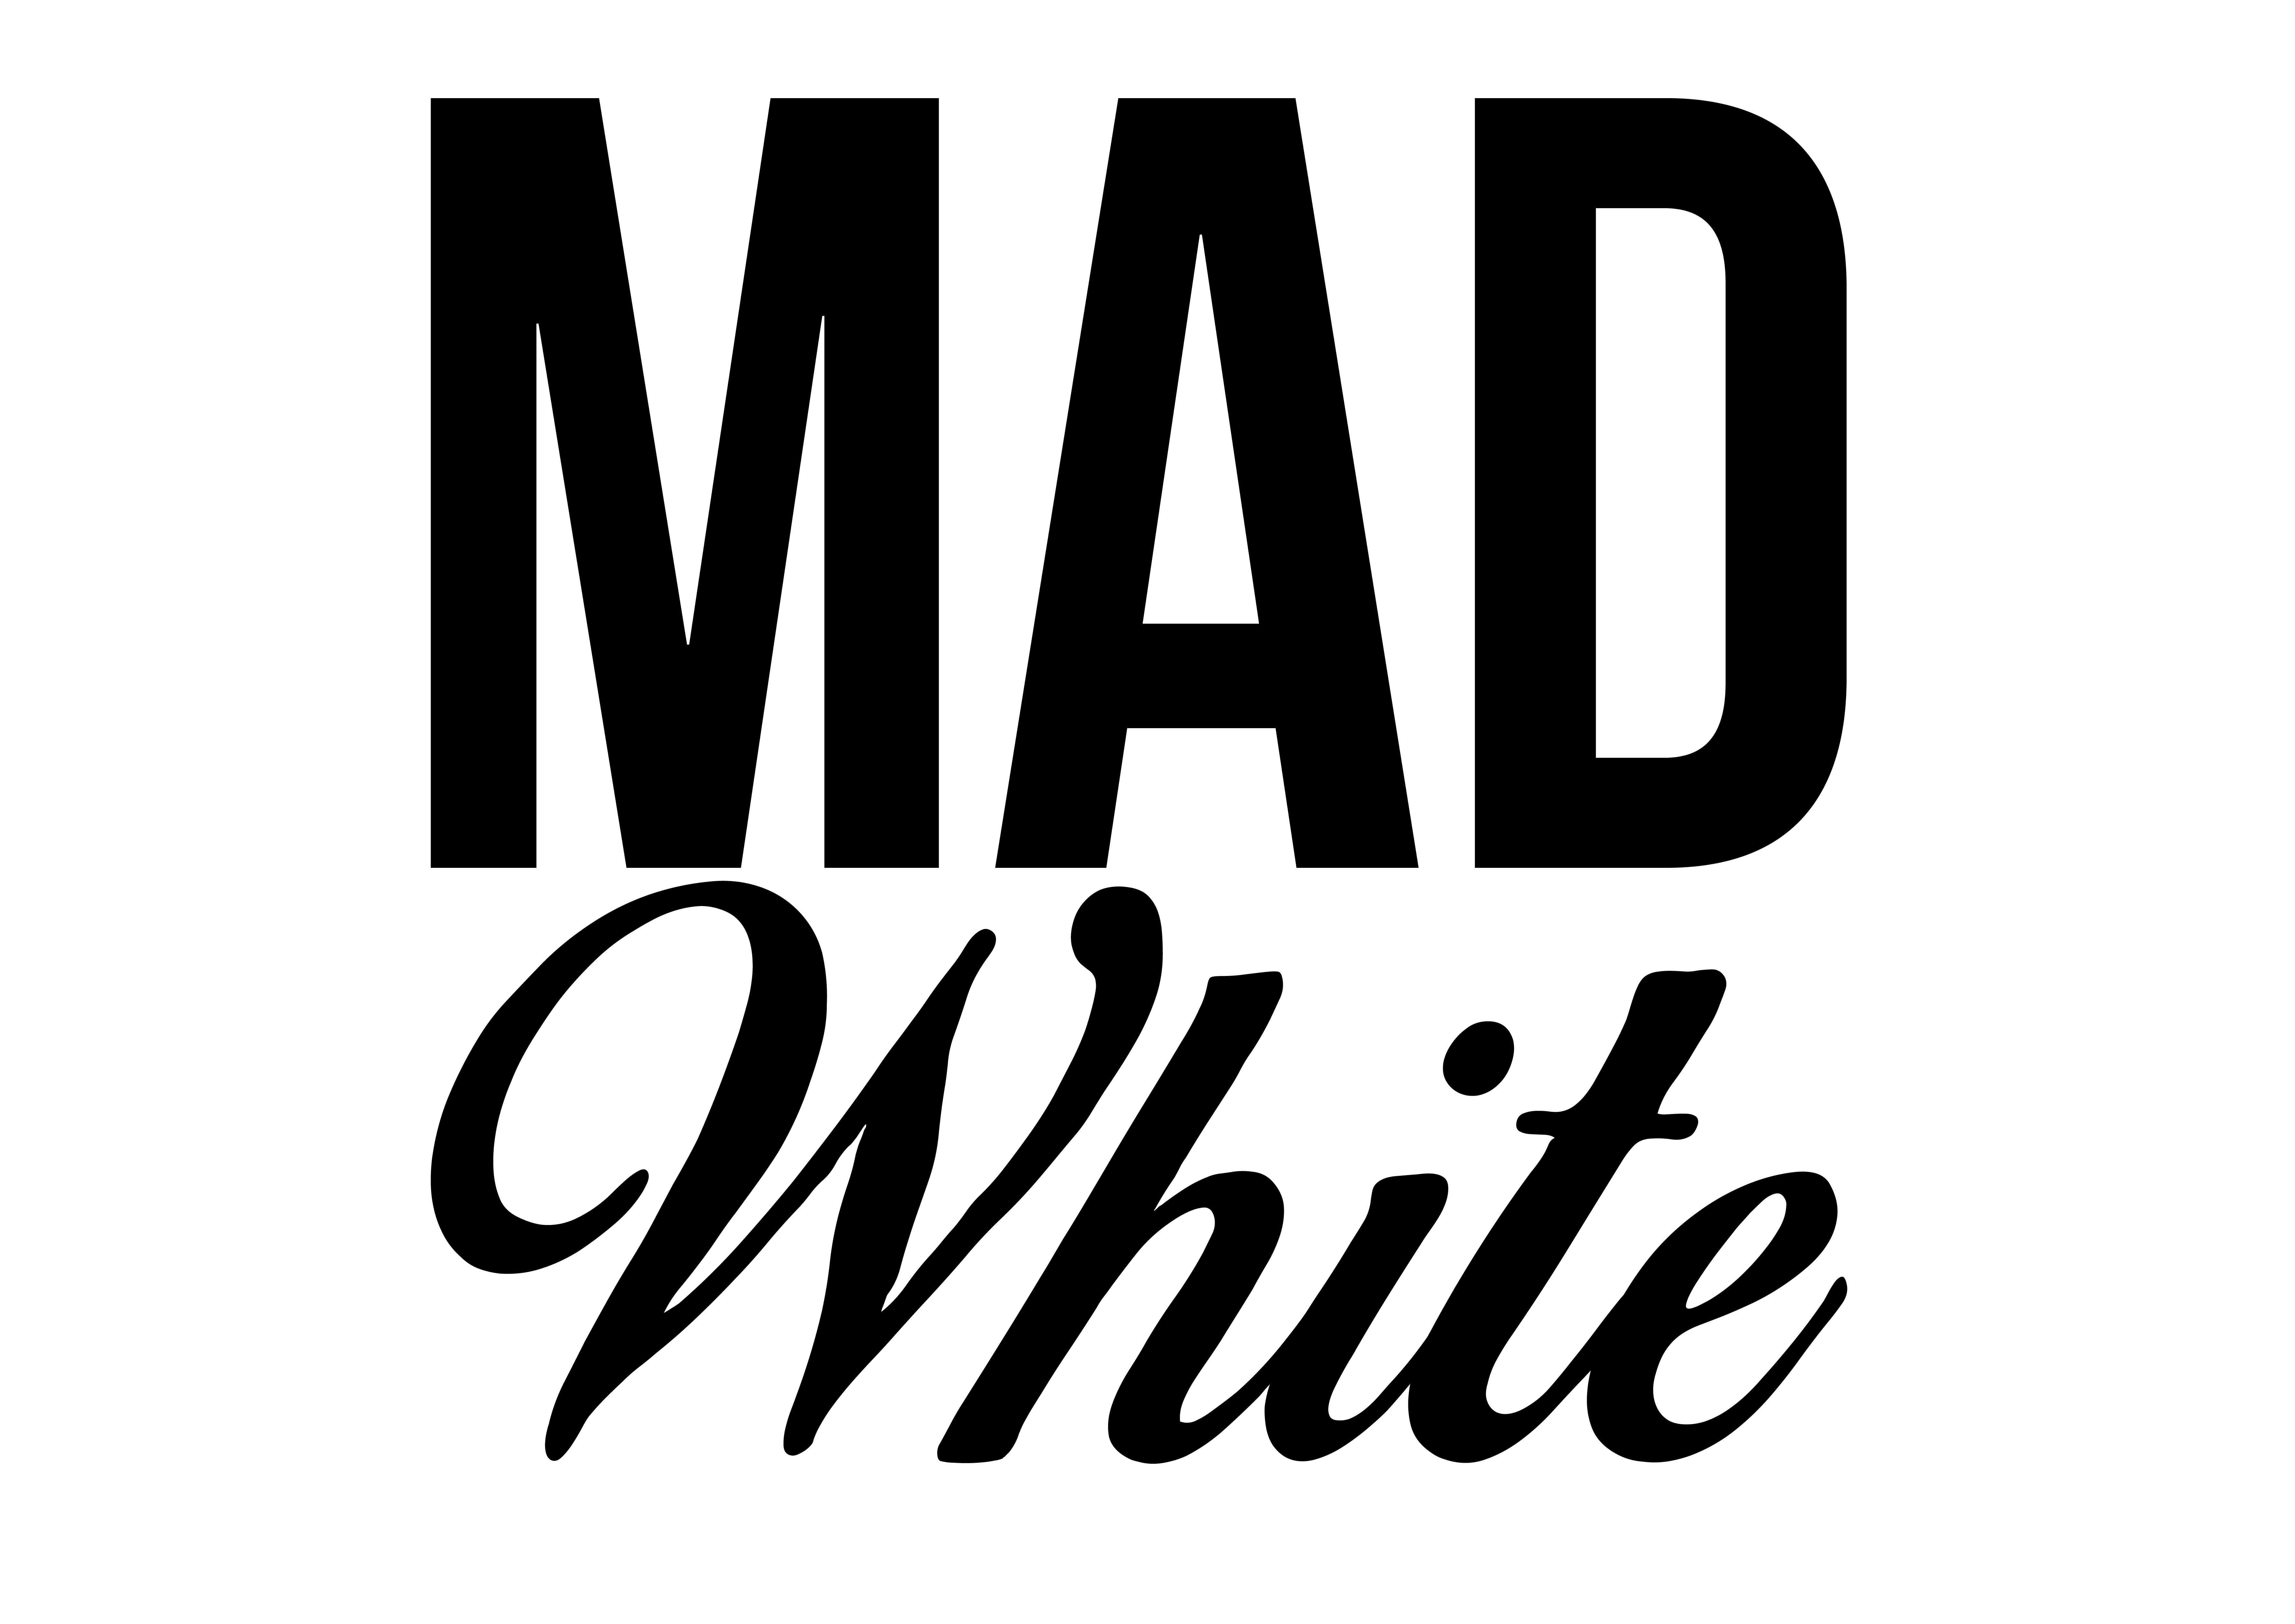 WhiteMad logo